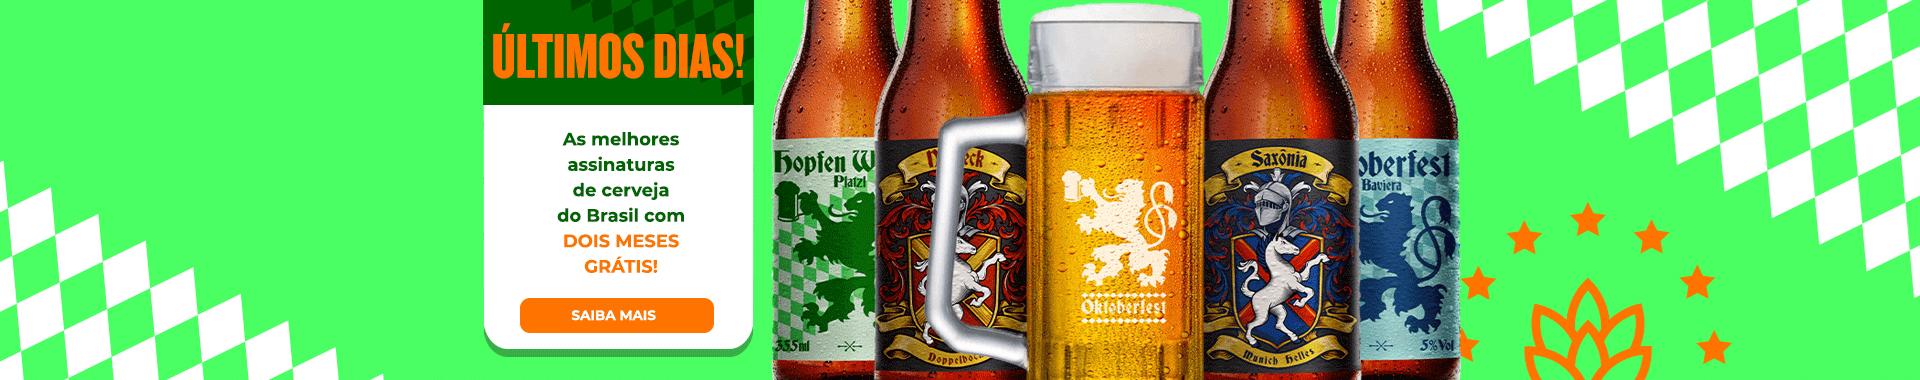 Beer Pack - Banner - Home - Desktop